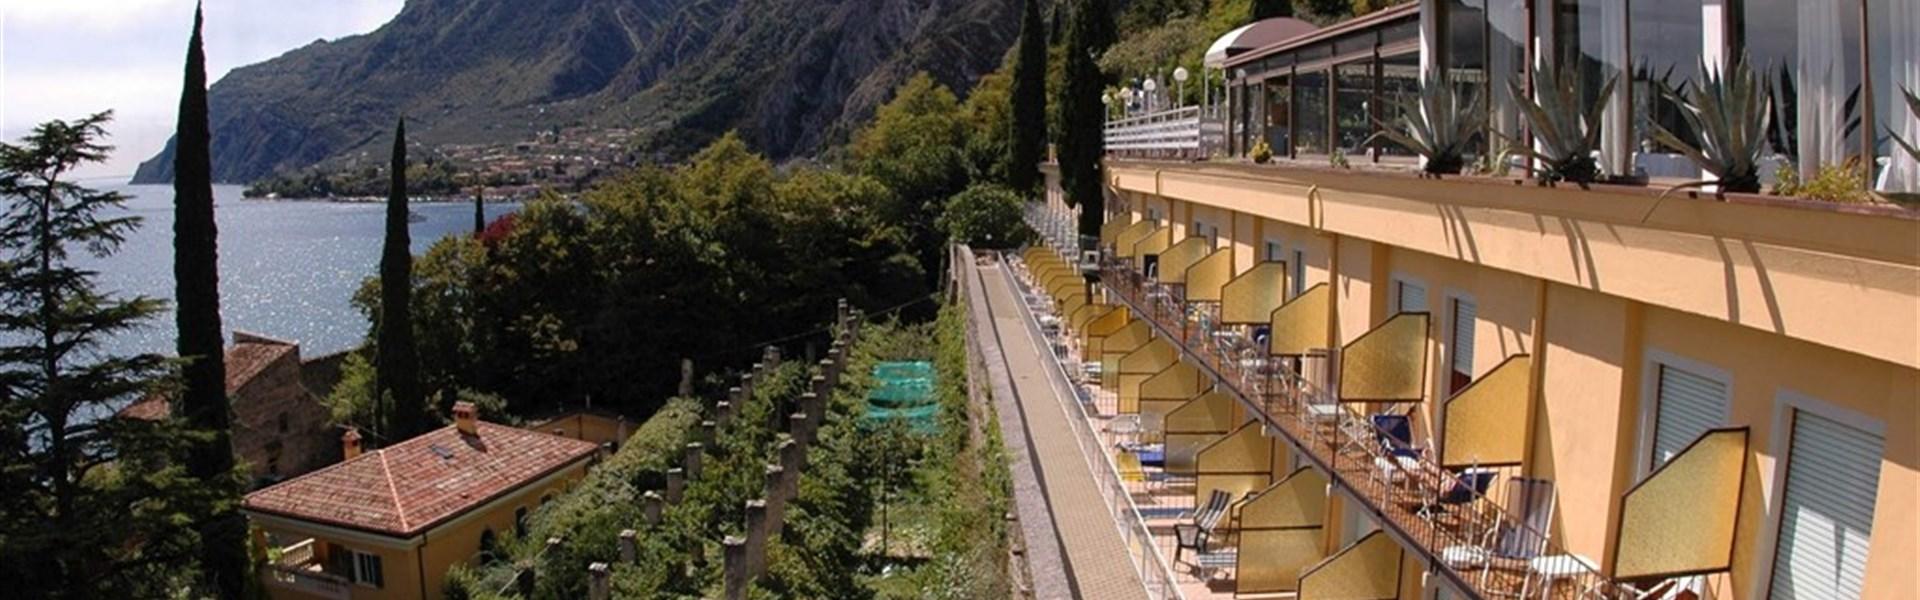 Hotel Villa Dirce -